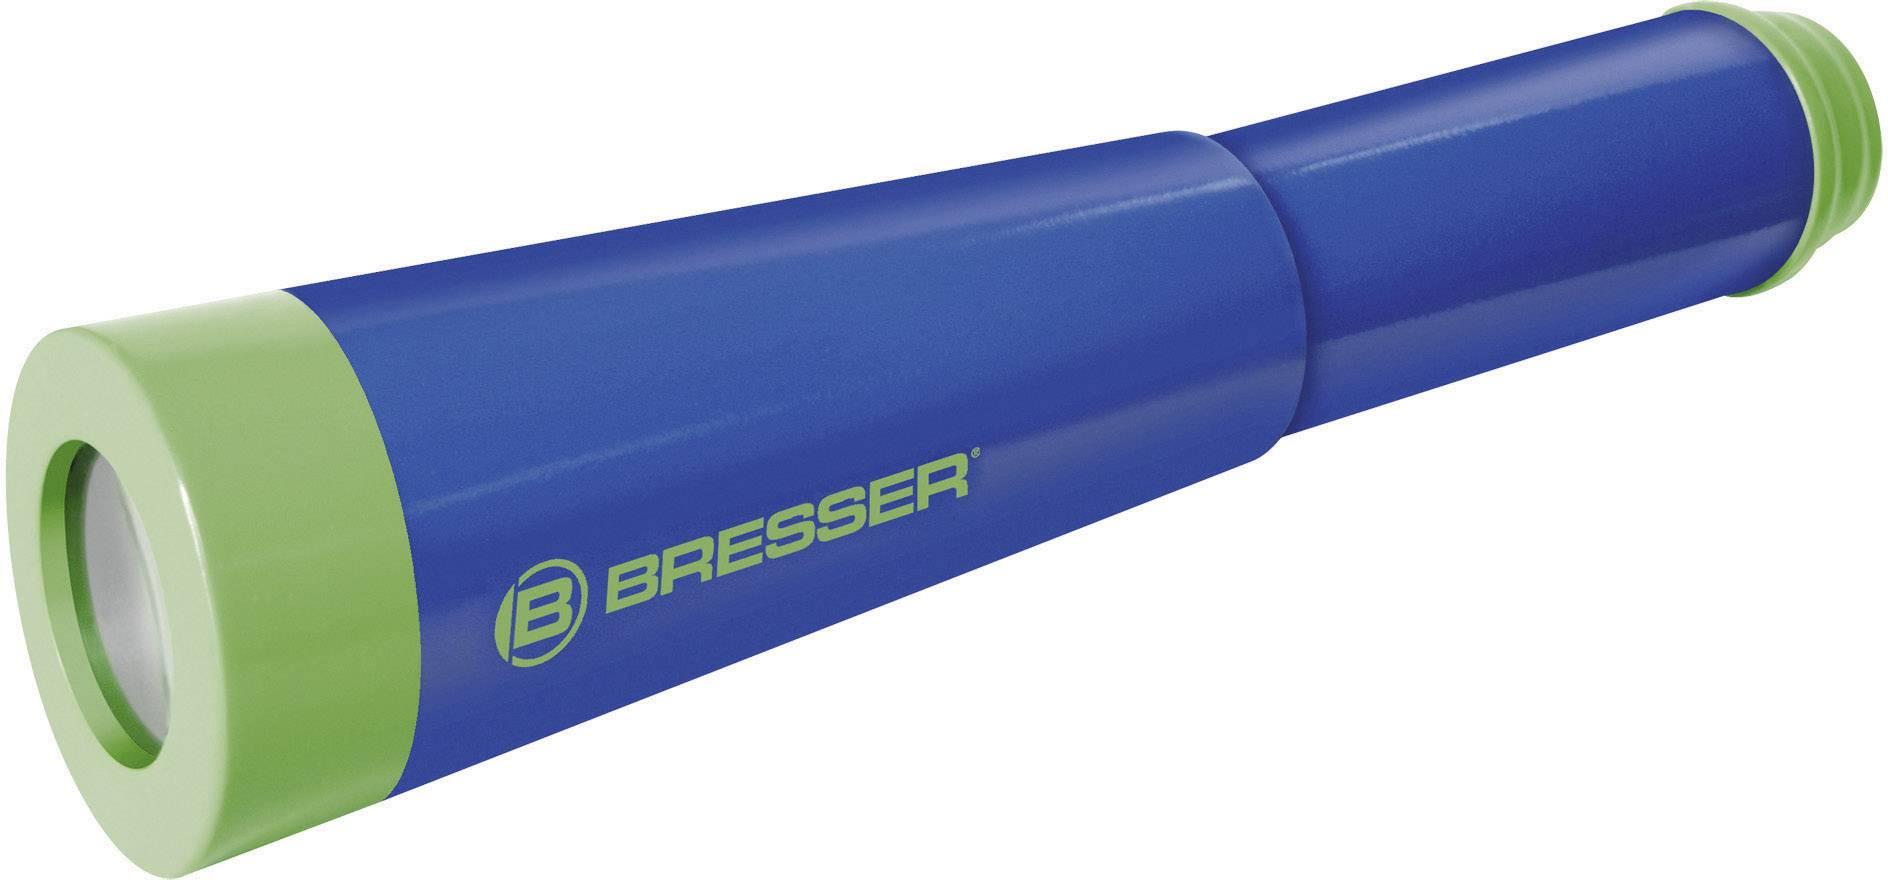 Dětský dalekohled Bresser Optik Junior, 8 x 32 mm, modrozelená